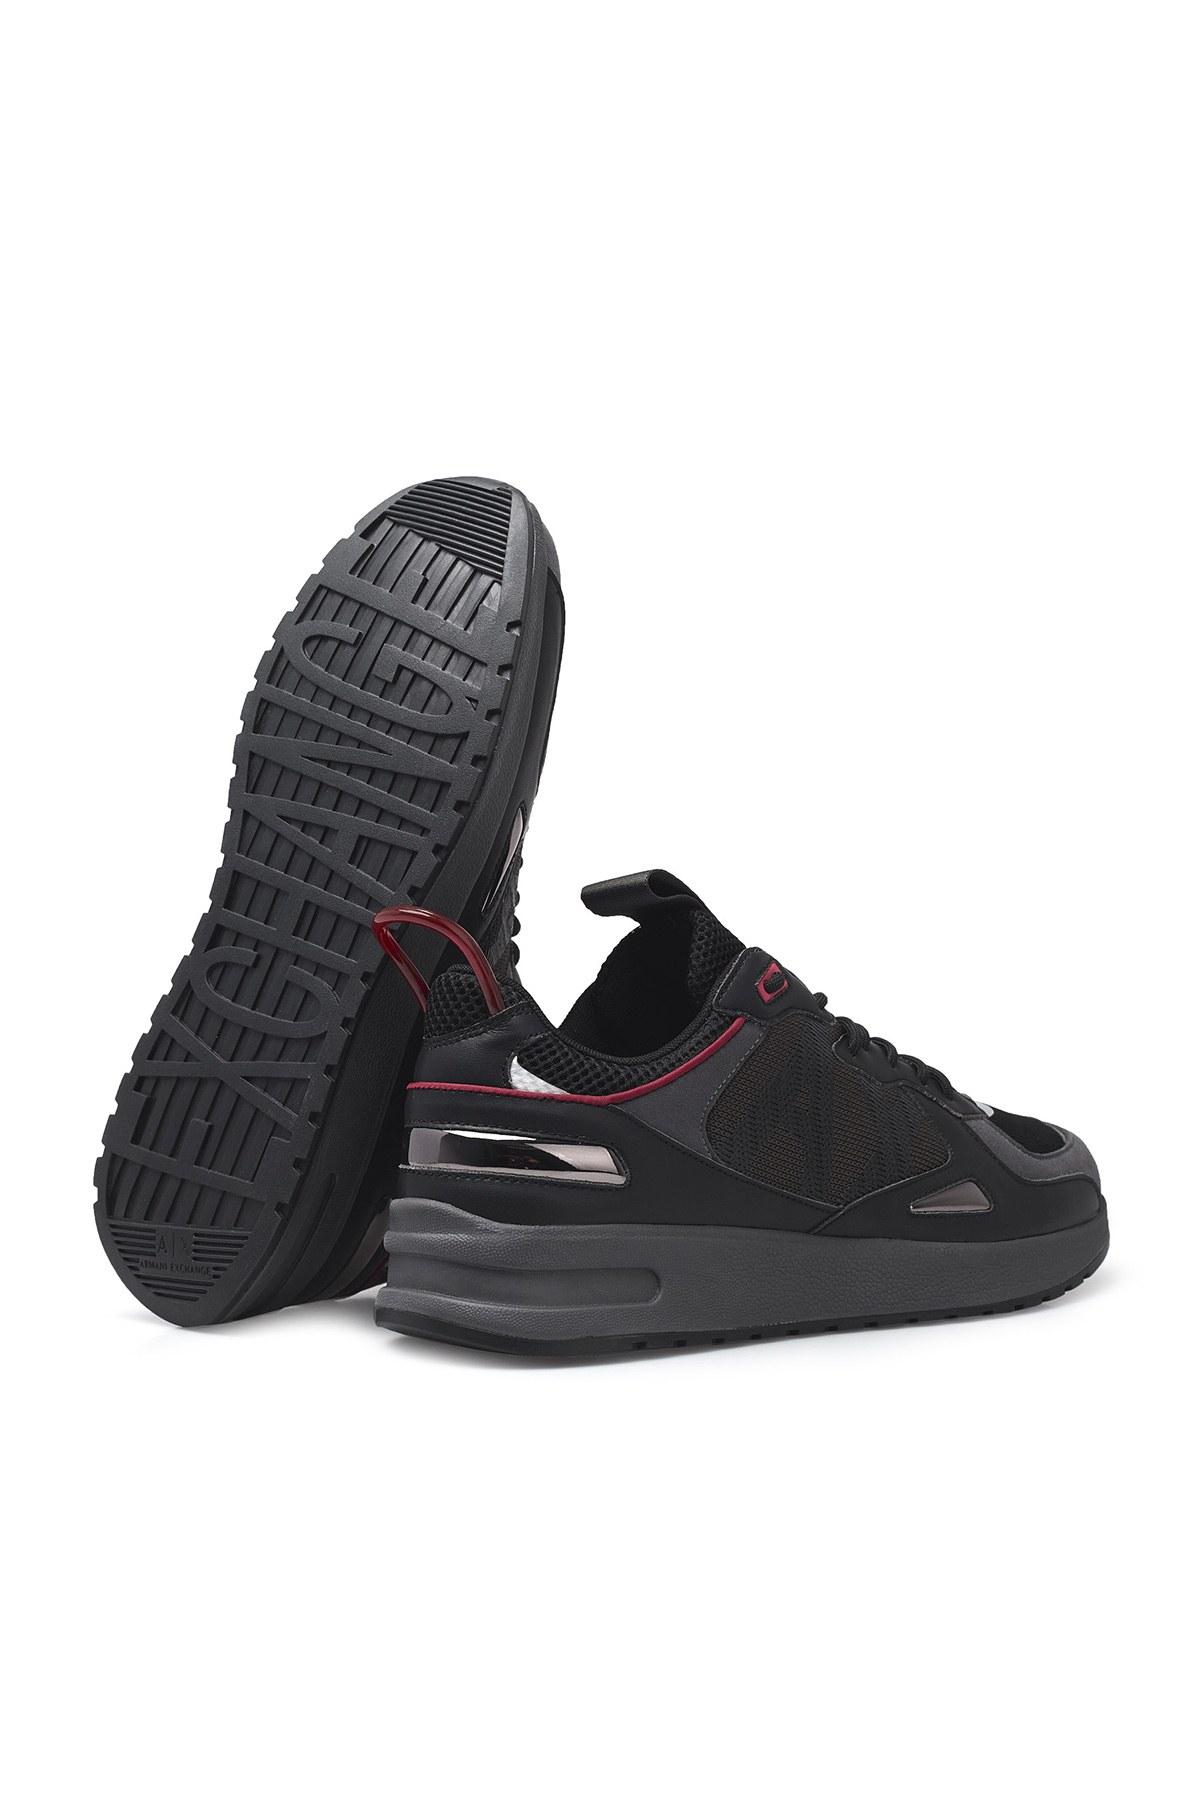 Armani Exchange Erkek Ayakkabı XUX070 XV241 K469 SİYAH